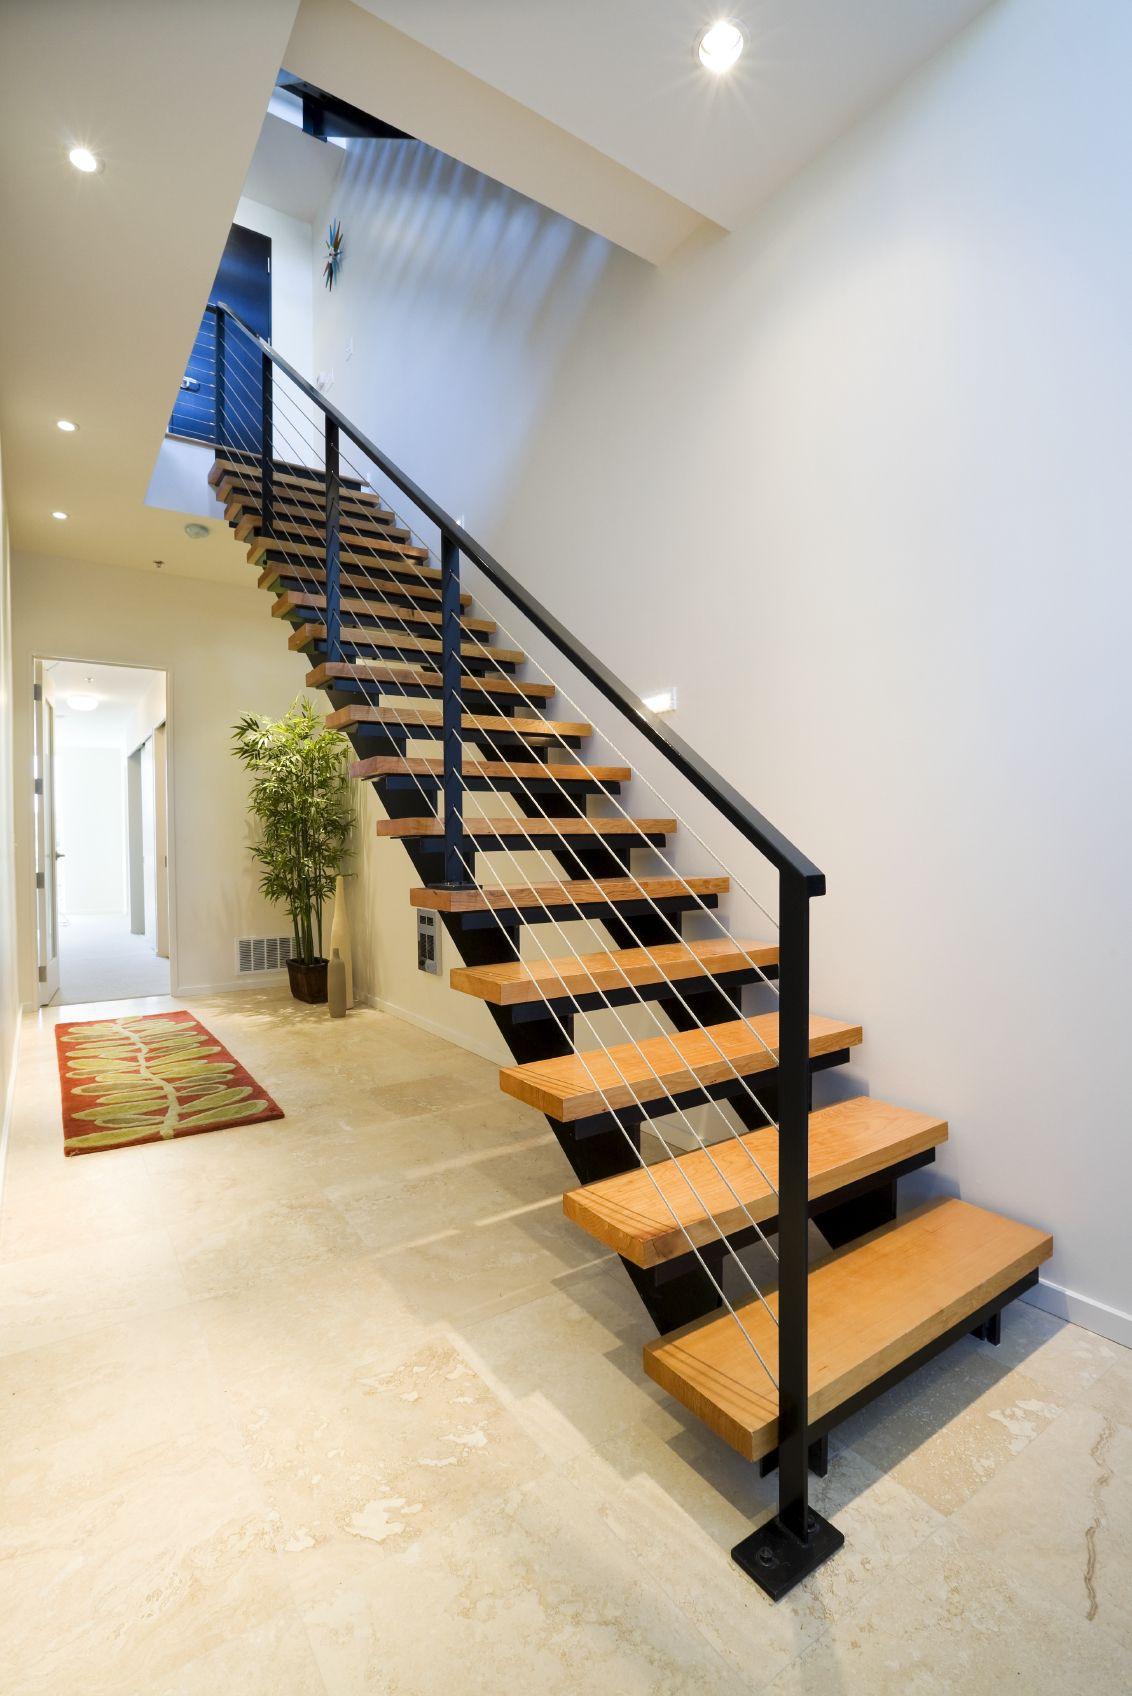 199 Foyer Design Ideas For 2018 All Colors Styles And Sizes  ~ Escaleras Prefabricadas De Madera